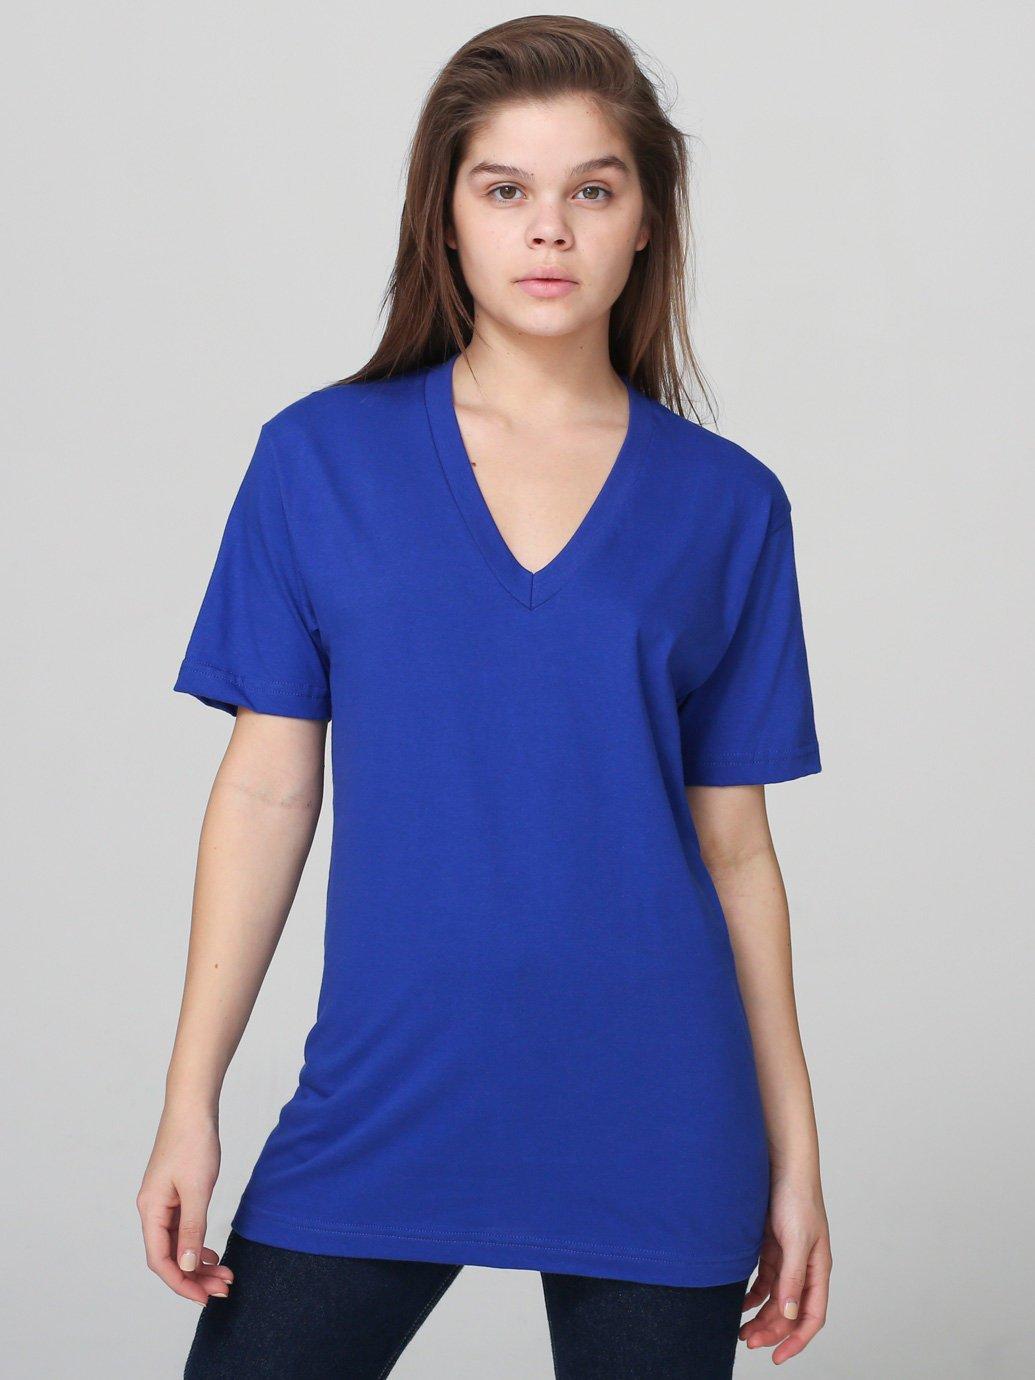 American Apparel Fine Jersey Short Sleeve V Neck Evan